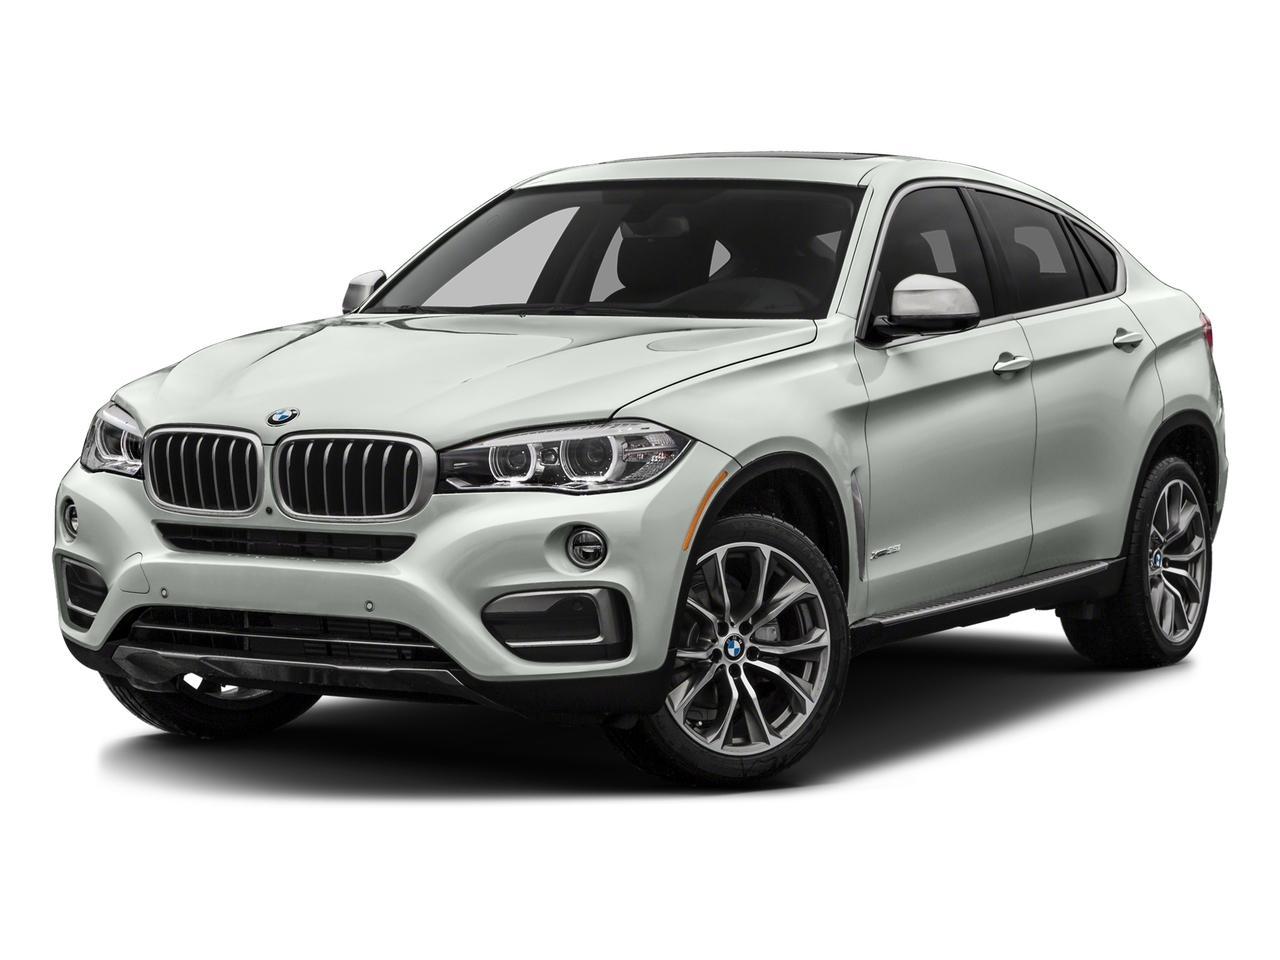 2016 BMW X6 xDrive35i Vehicle Photo in Temple, TX 76502